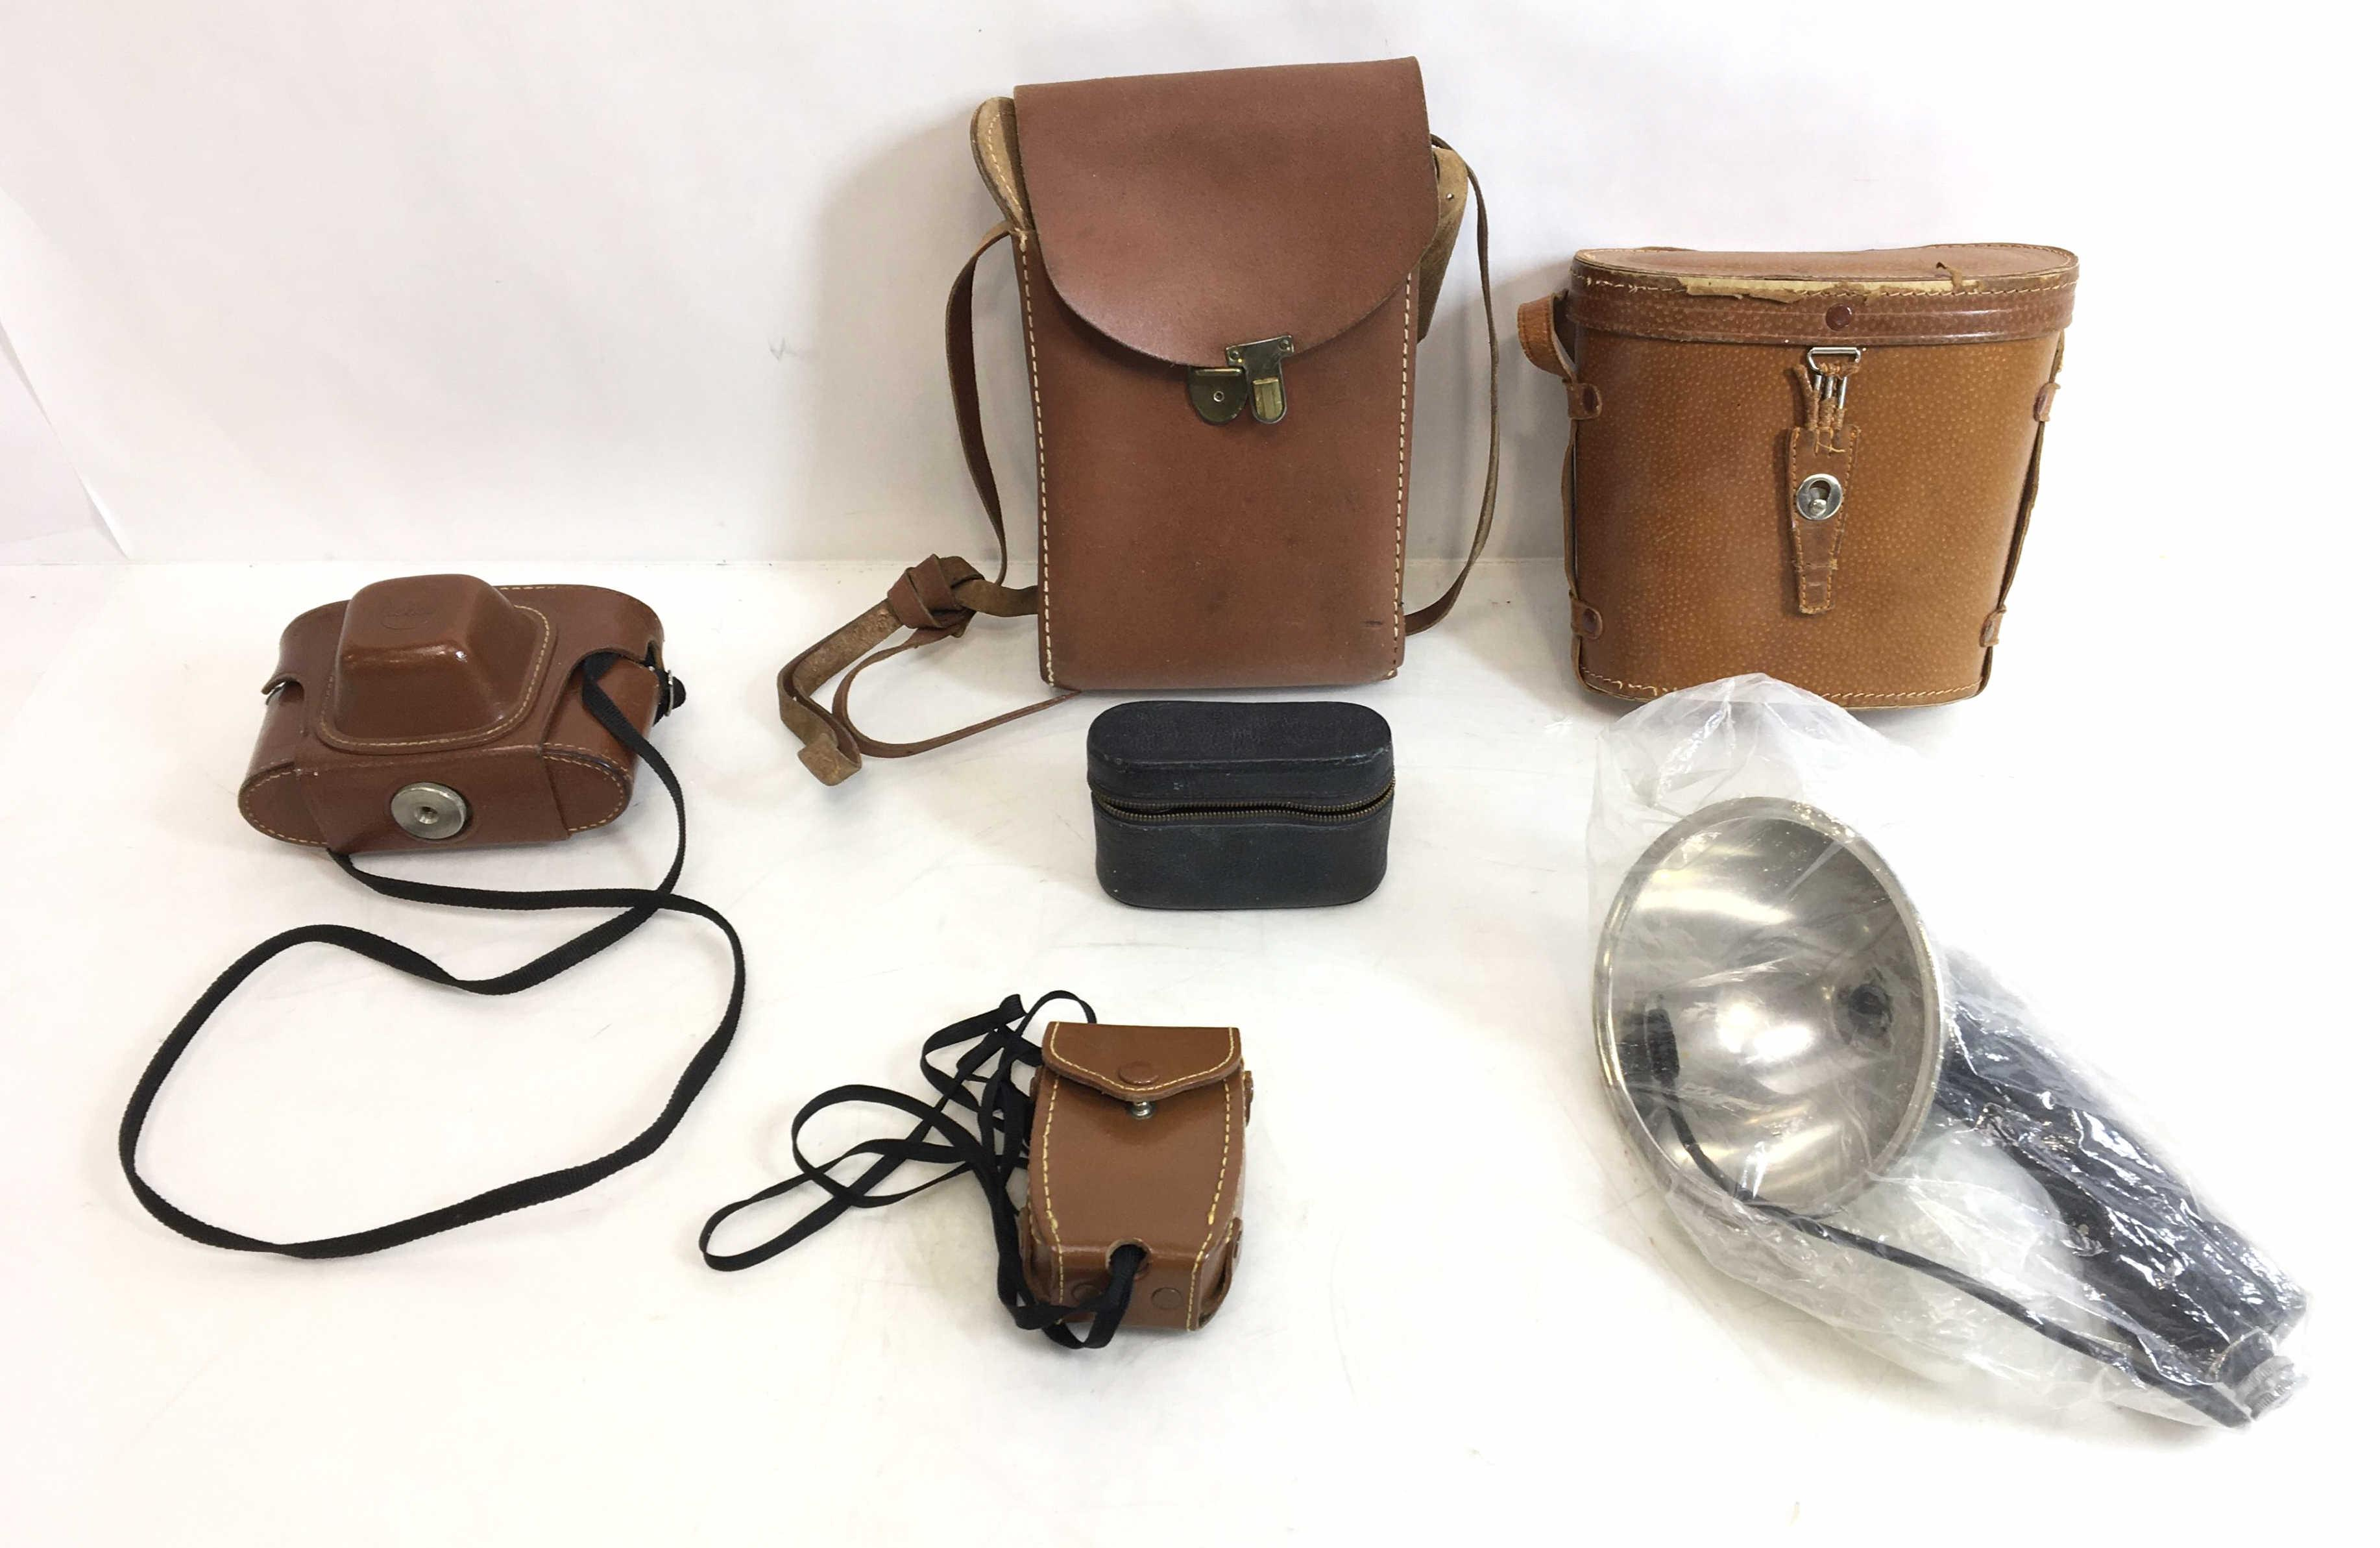 (6pc) Revere, GE, Kodak Cameras, Binoculars